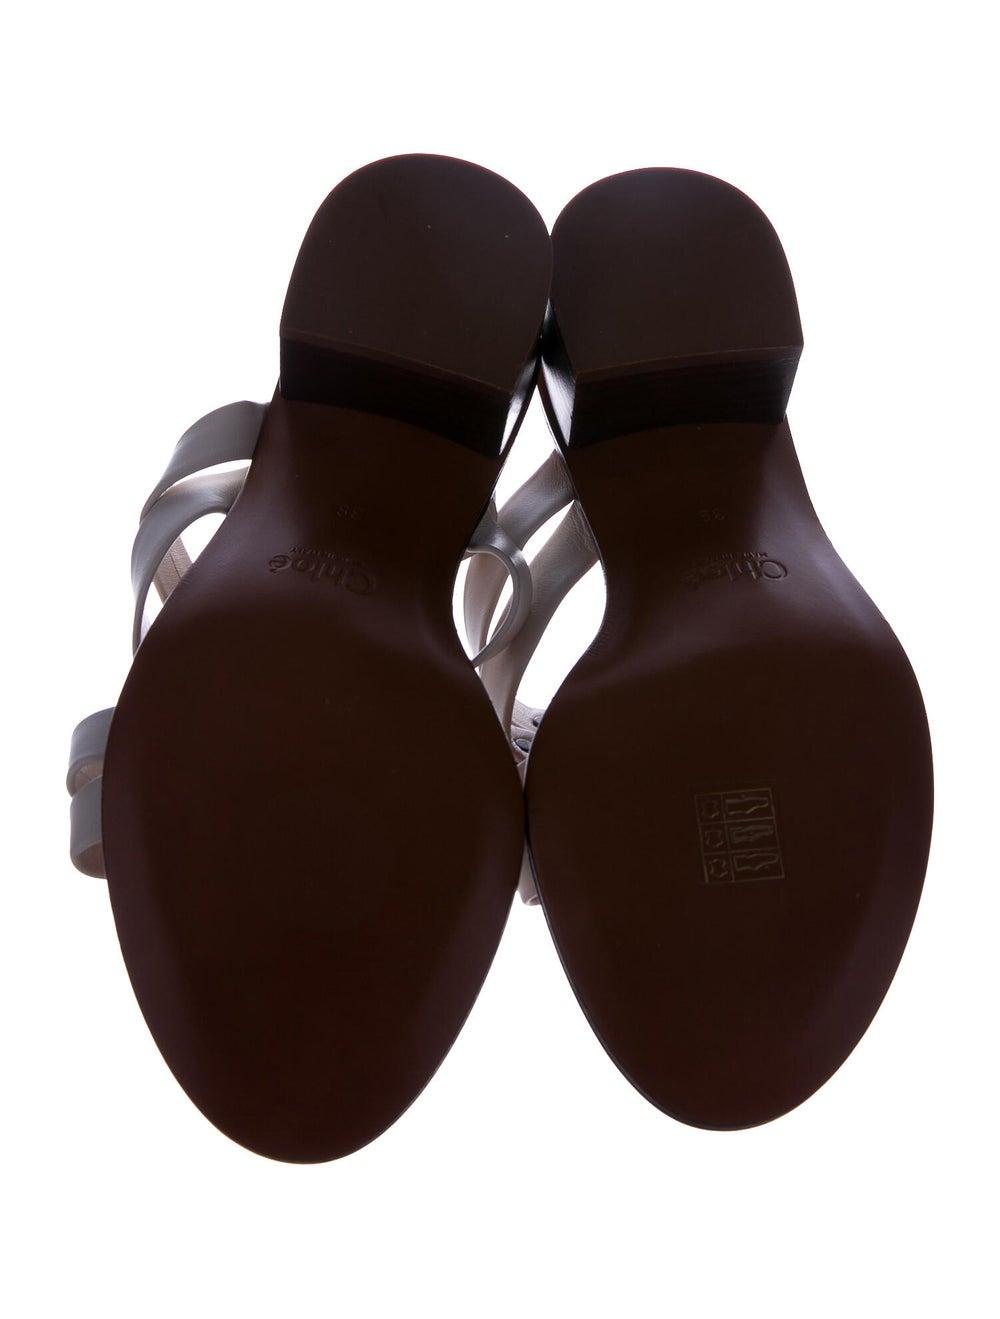 Chloé Leather Slides - image 5